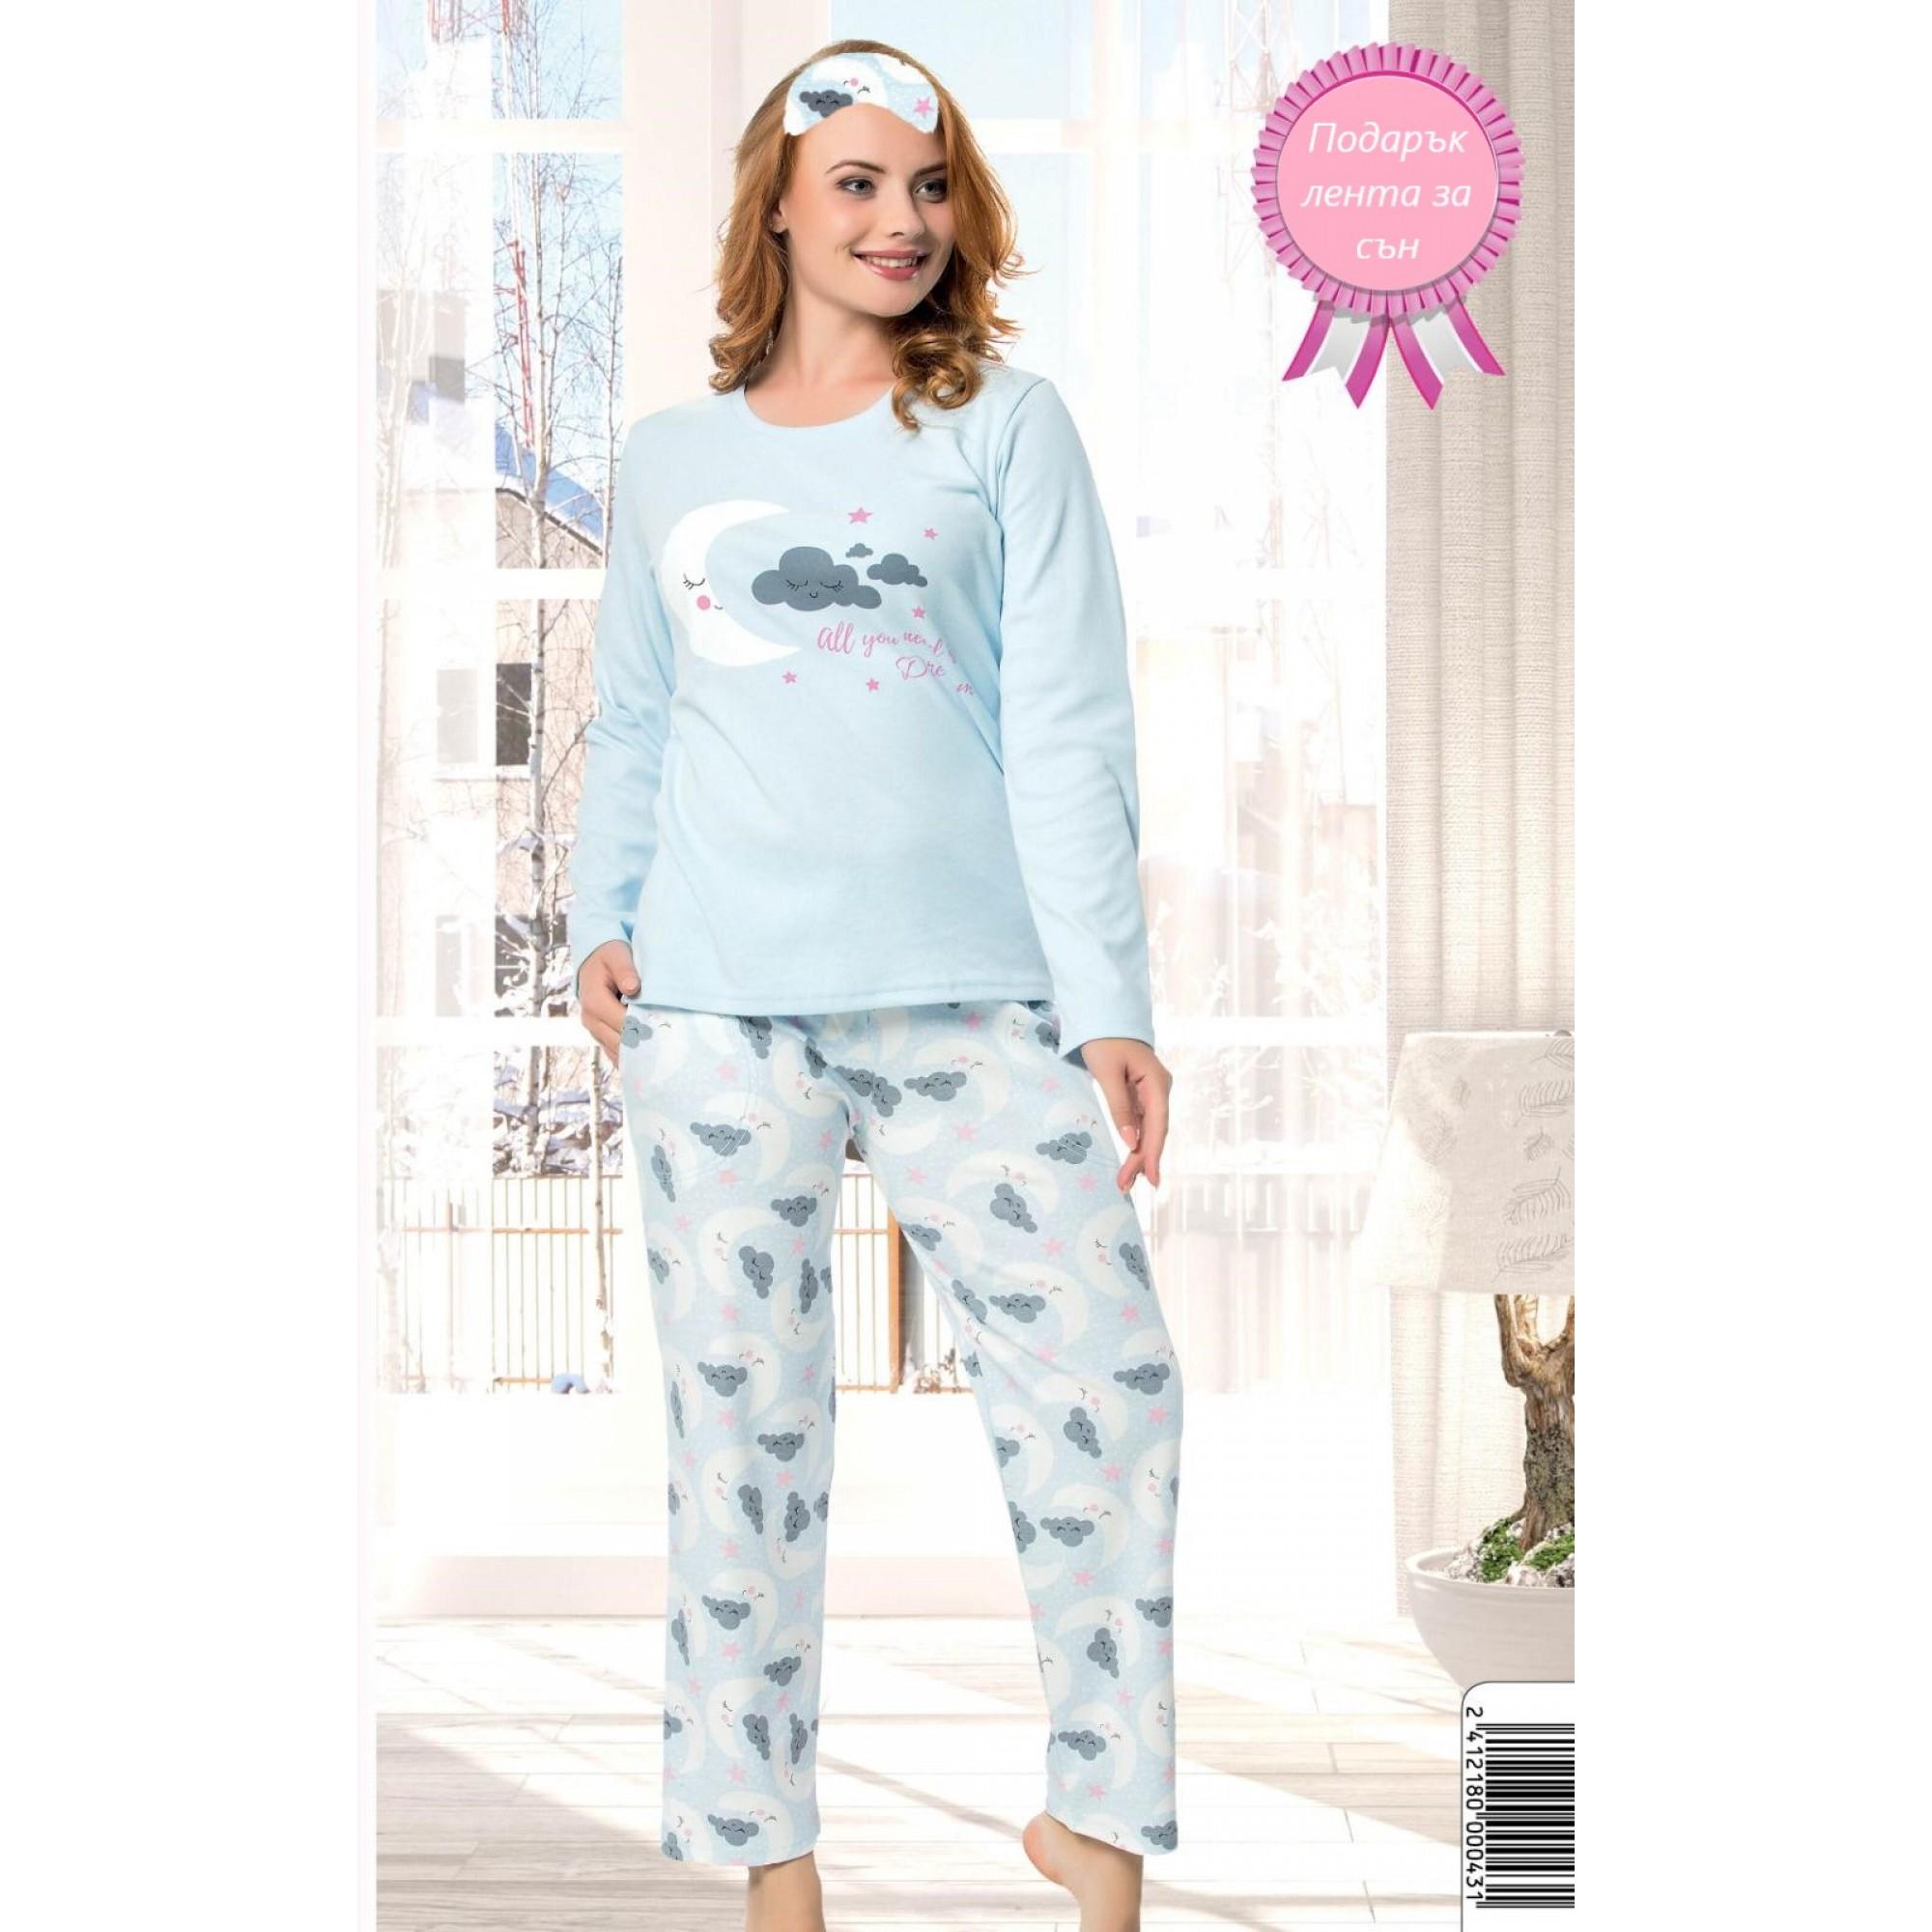 Дамска пижама интерлог Облаче